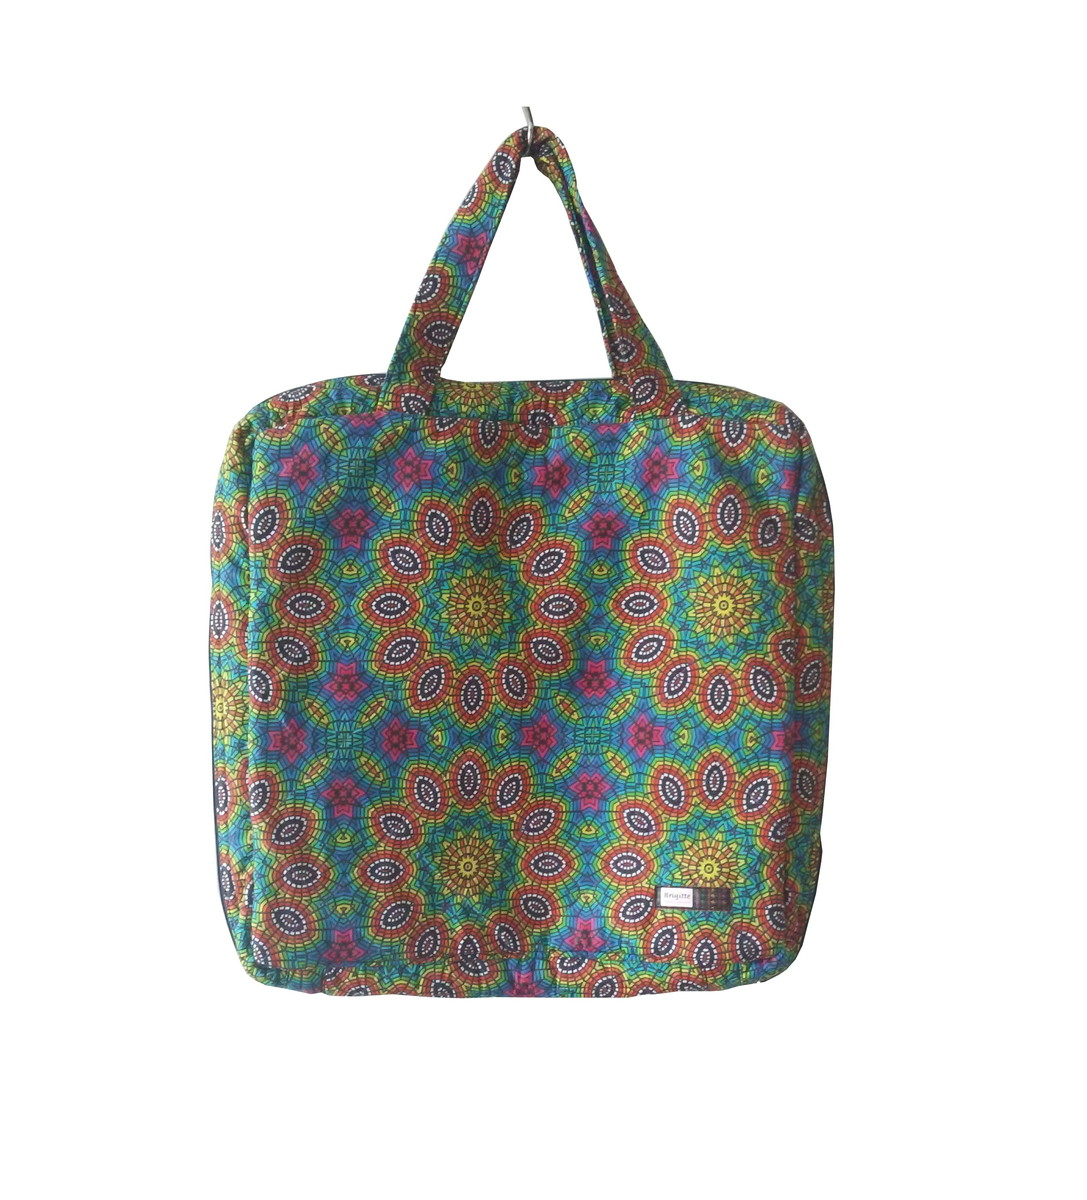 Bolsa De Tecido Hippie : Pasta universit?ria grande hippie brigitte bags elo